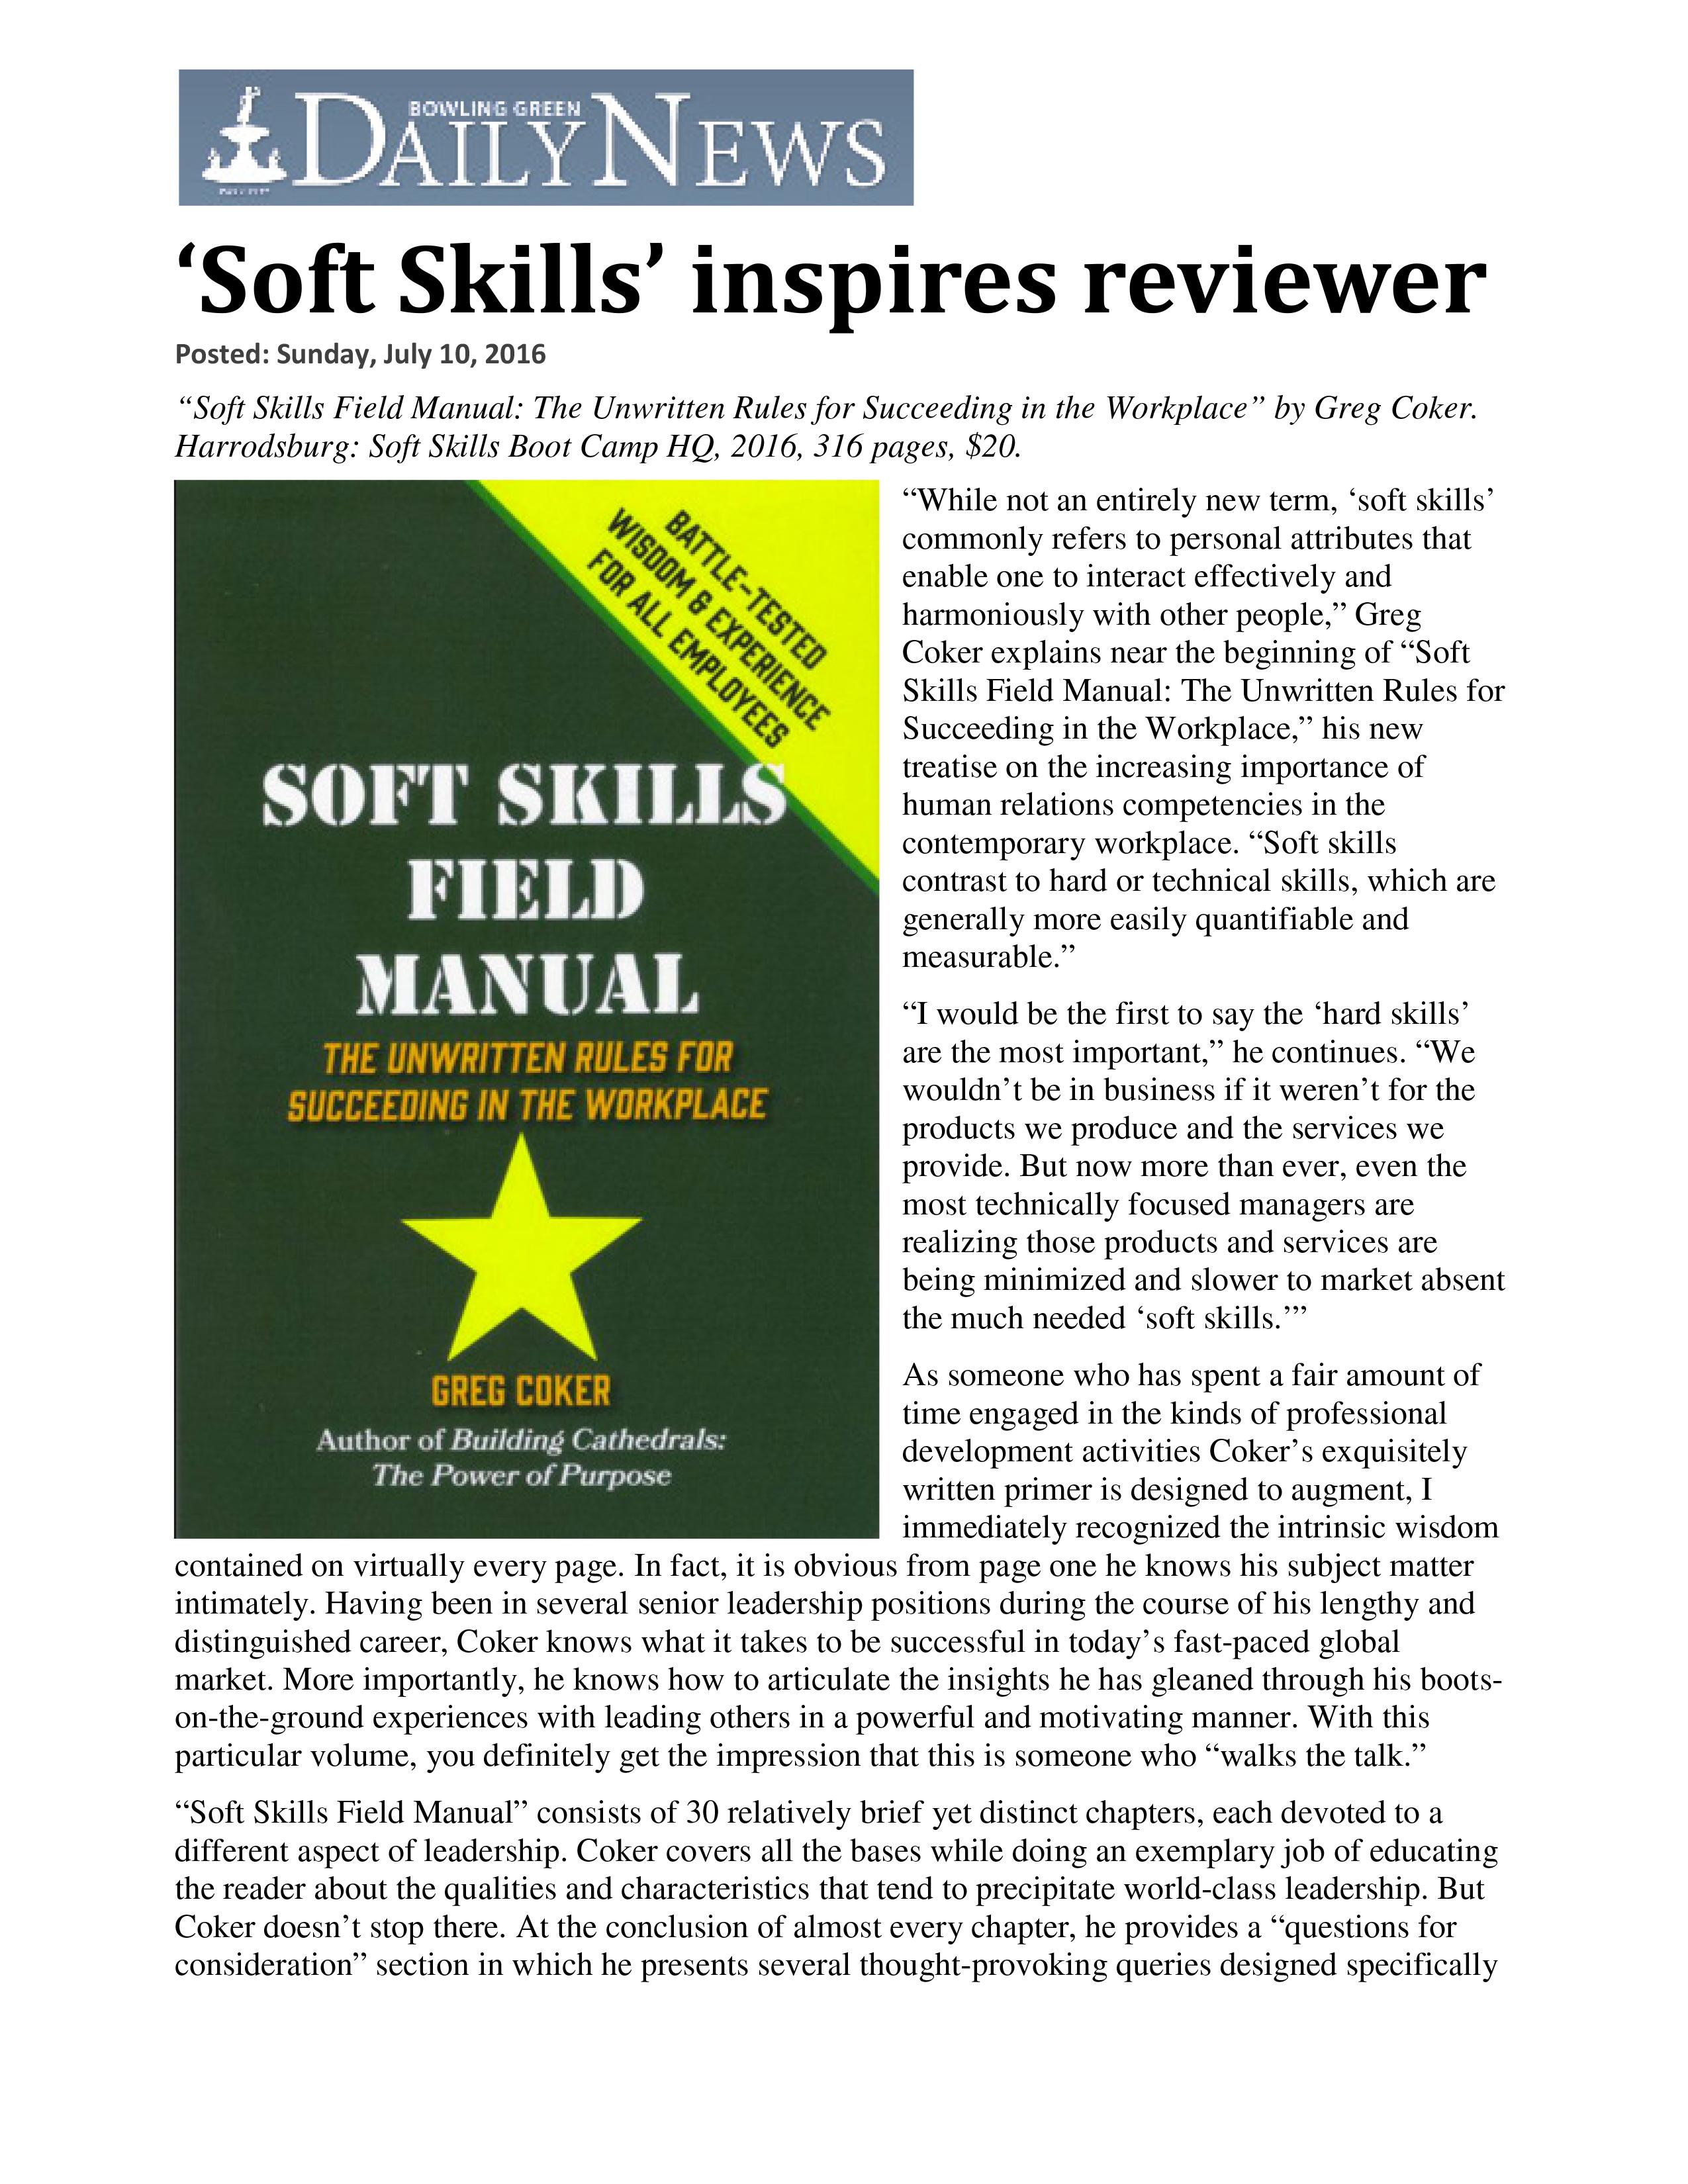 Microsoft Word - SoftSkills DN